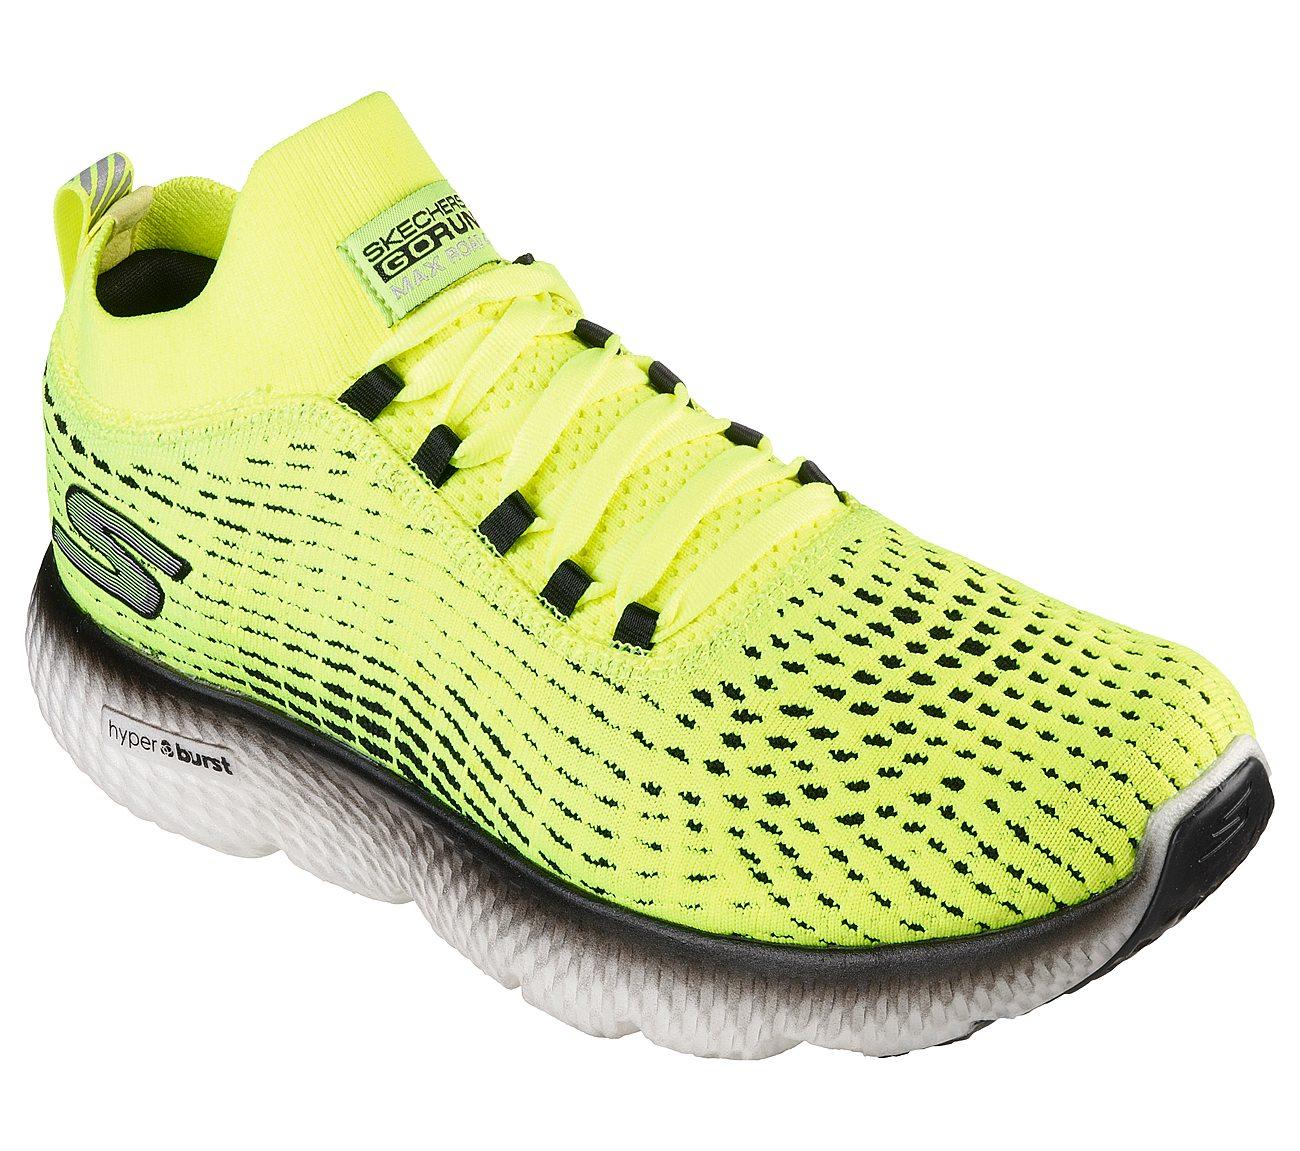 encuesta Clasificar Marinero  Buy SKECHERS Skechers GOrun MaxRoad 4 Hyper Skechers Performance Shoes